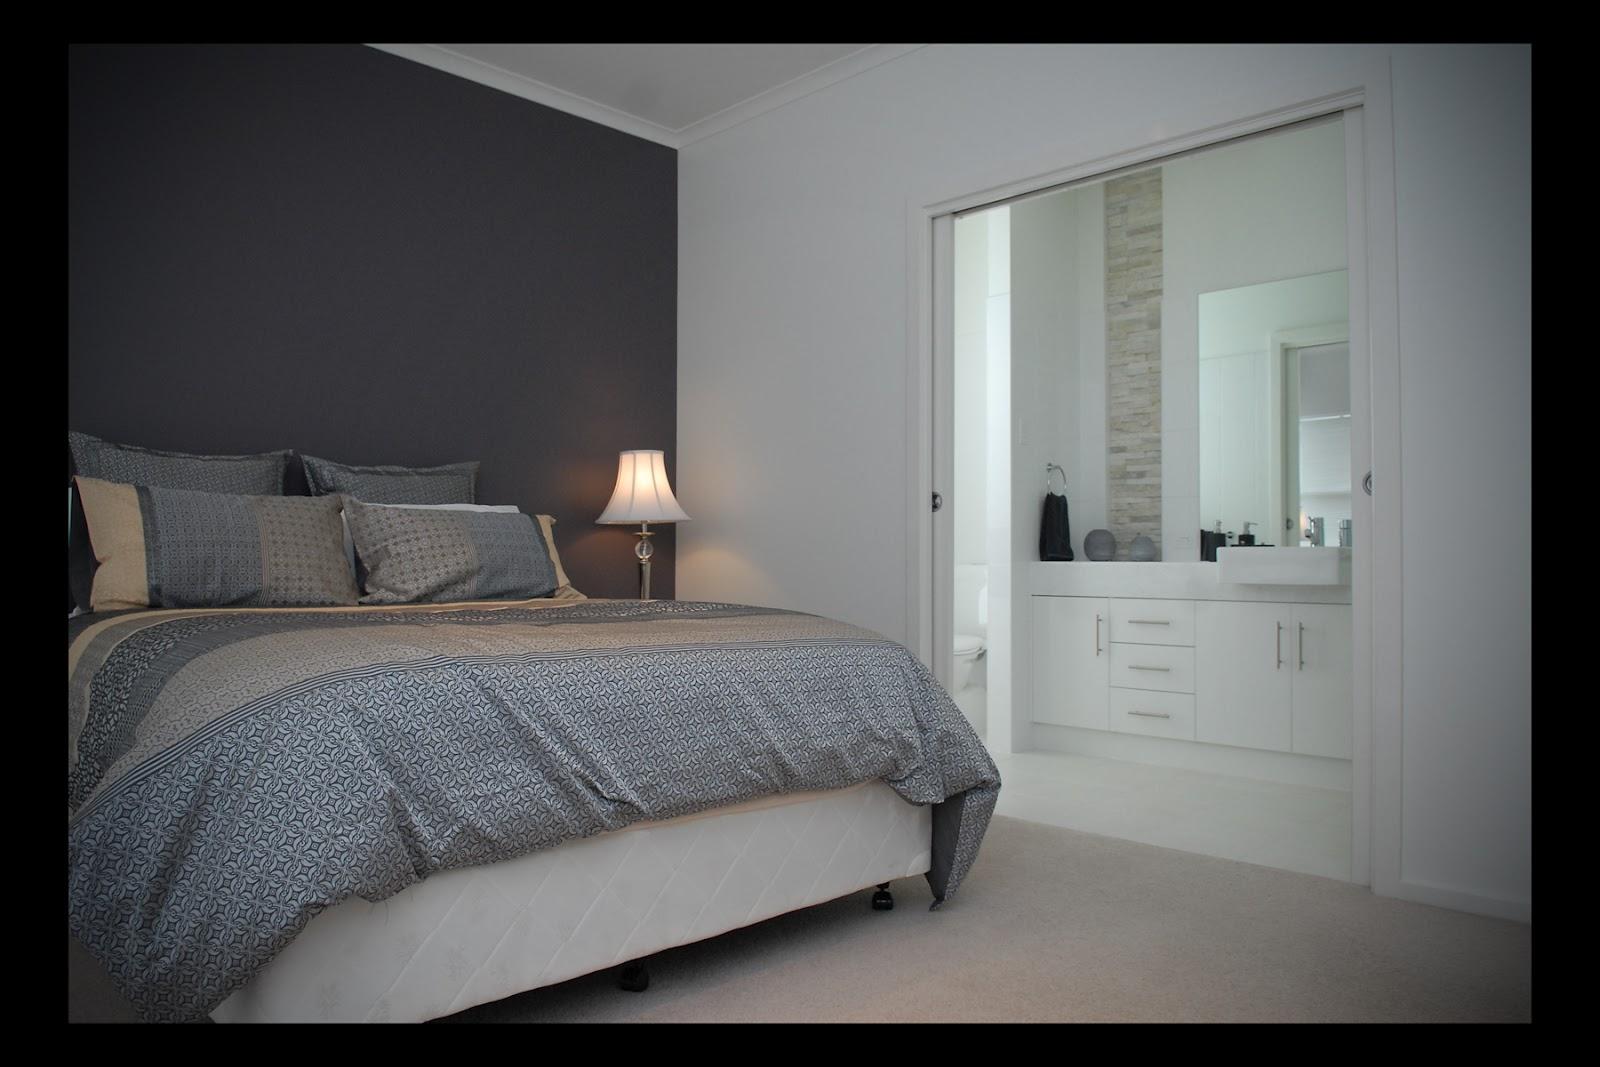 Exclusive bedroom interior design for Exclusive bedroom designs